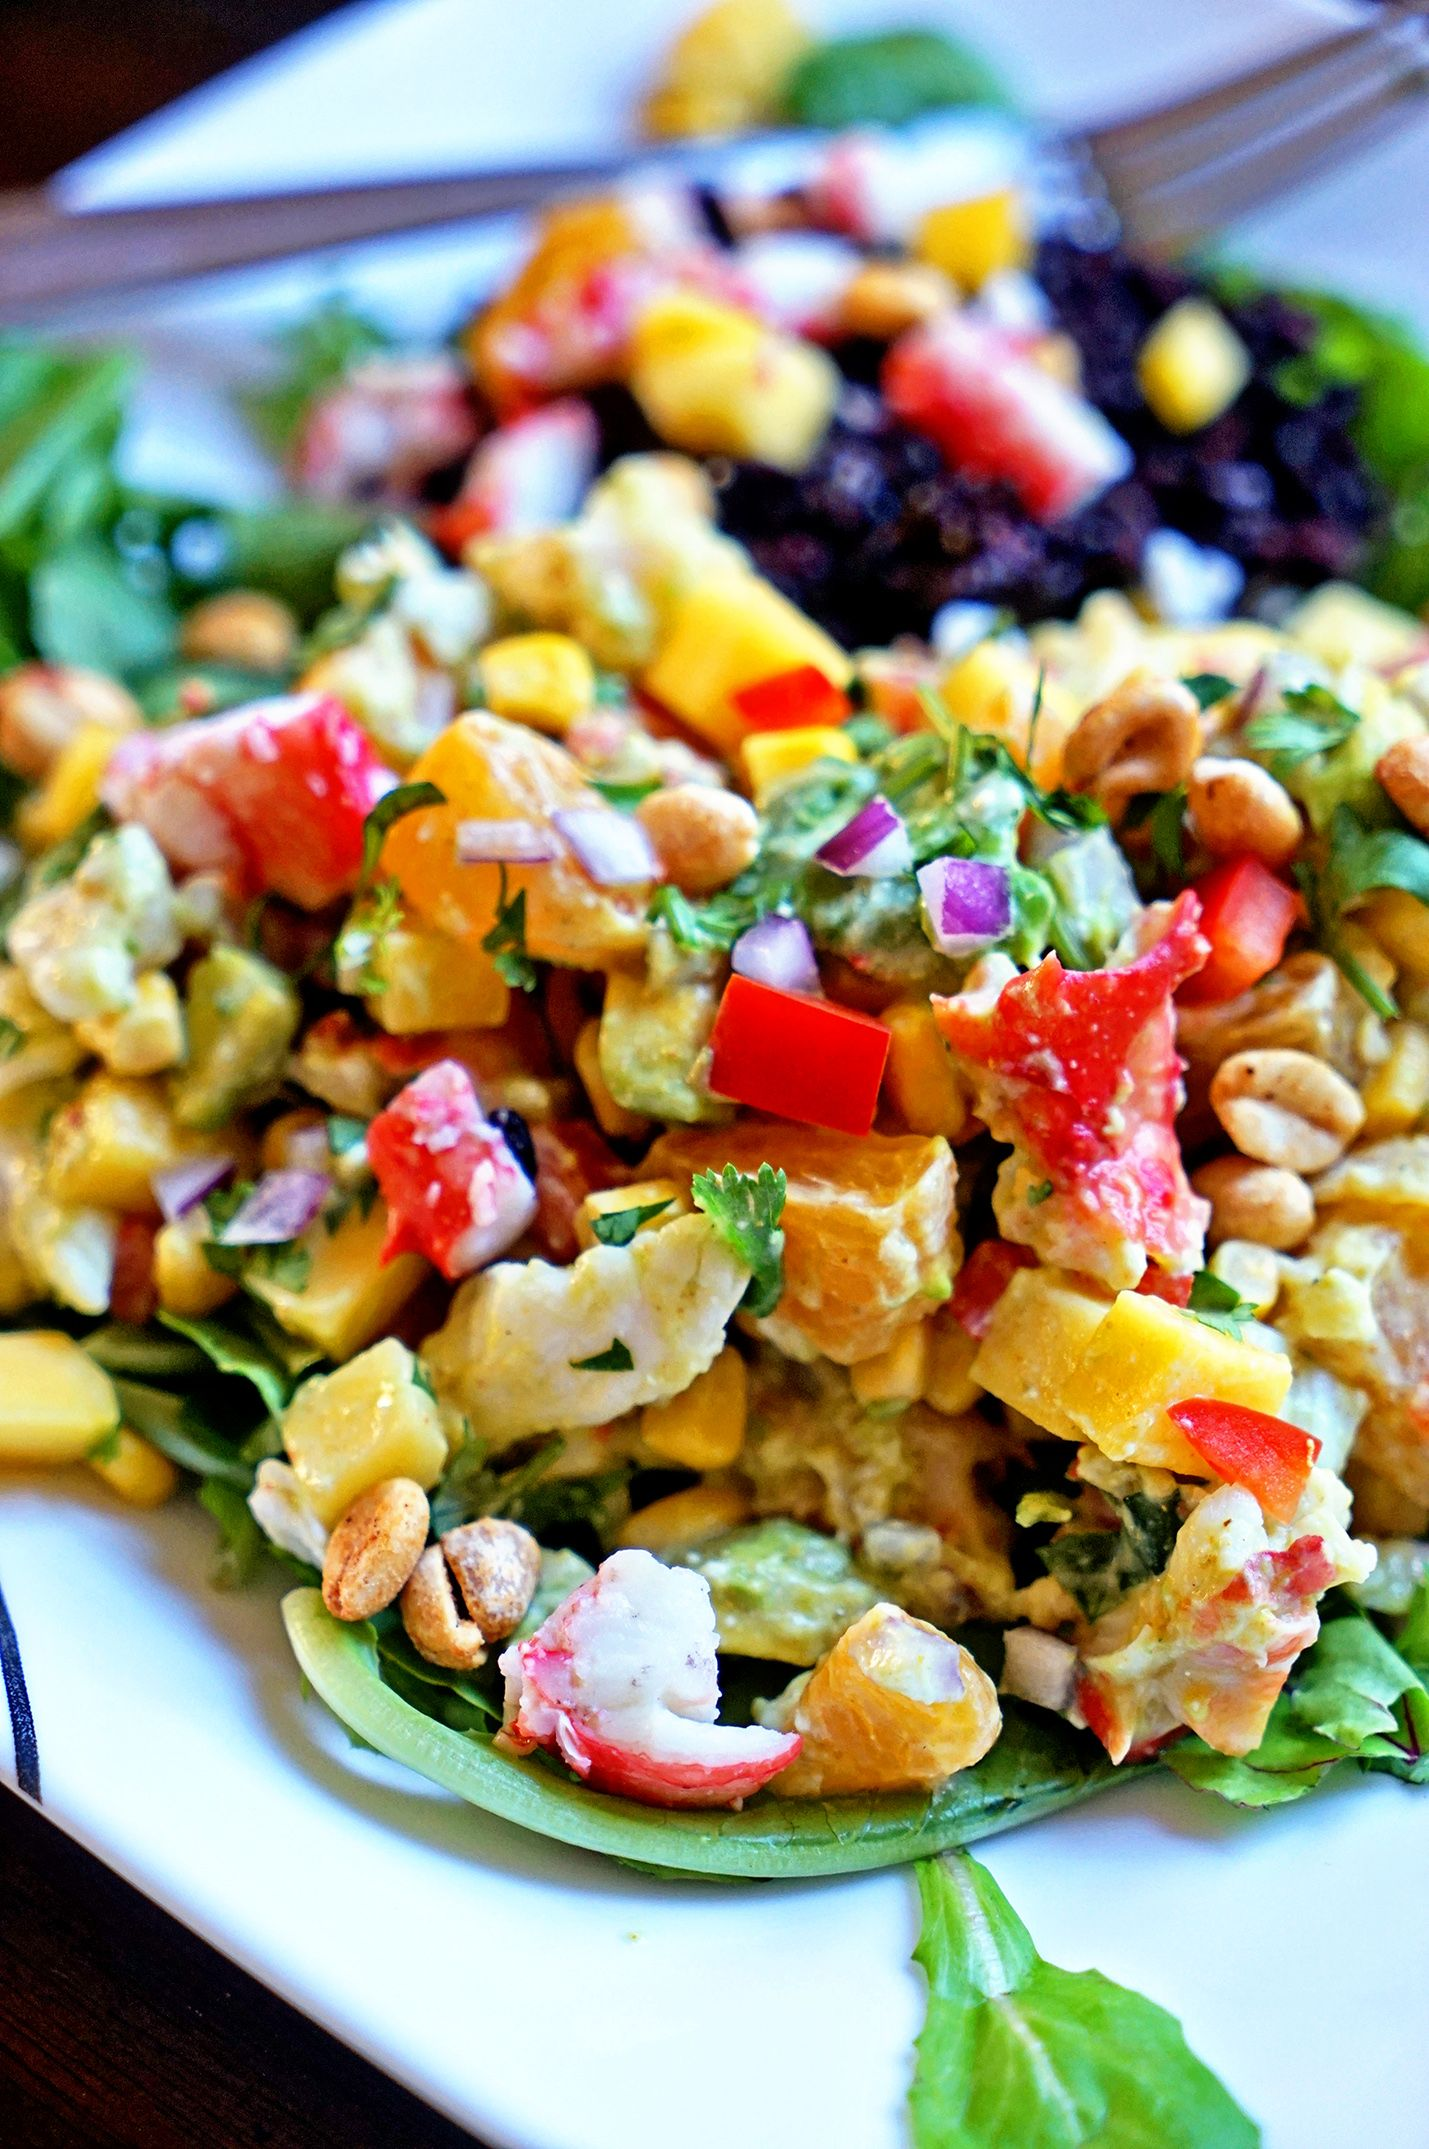 Papaya Crab Salad with Black Rice